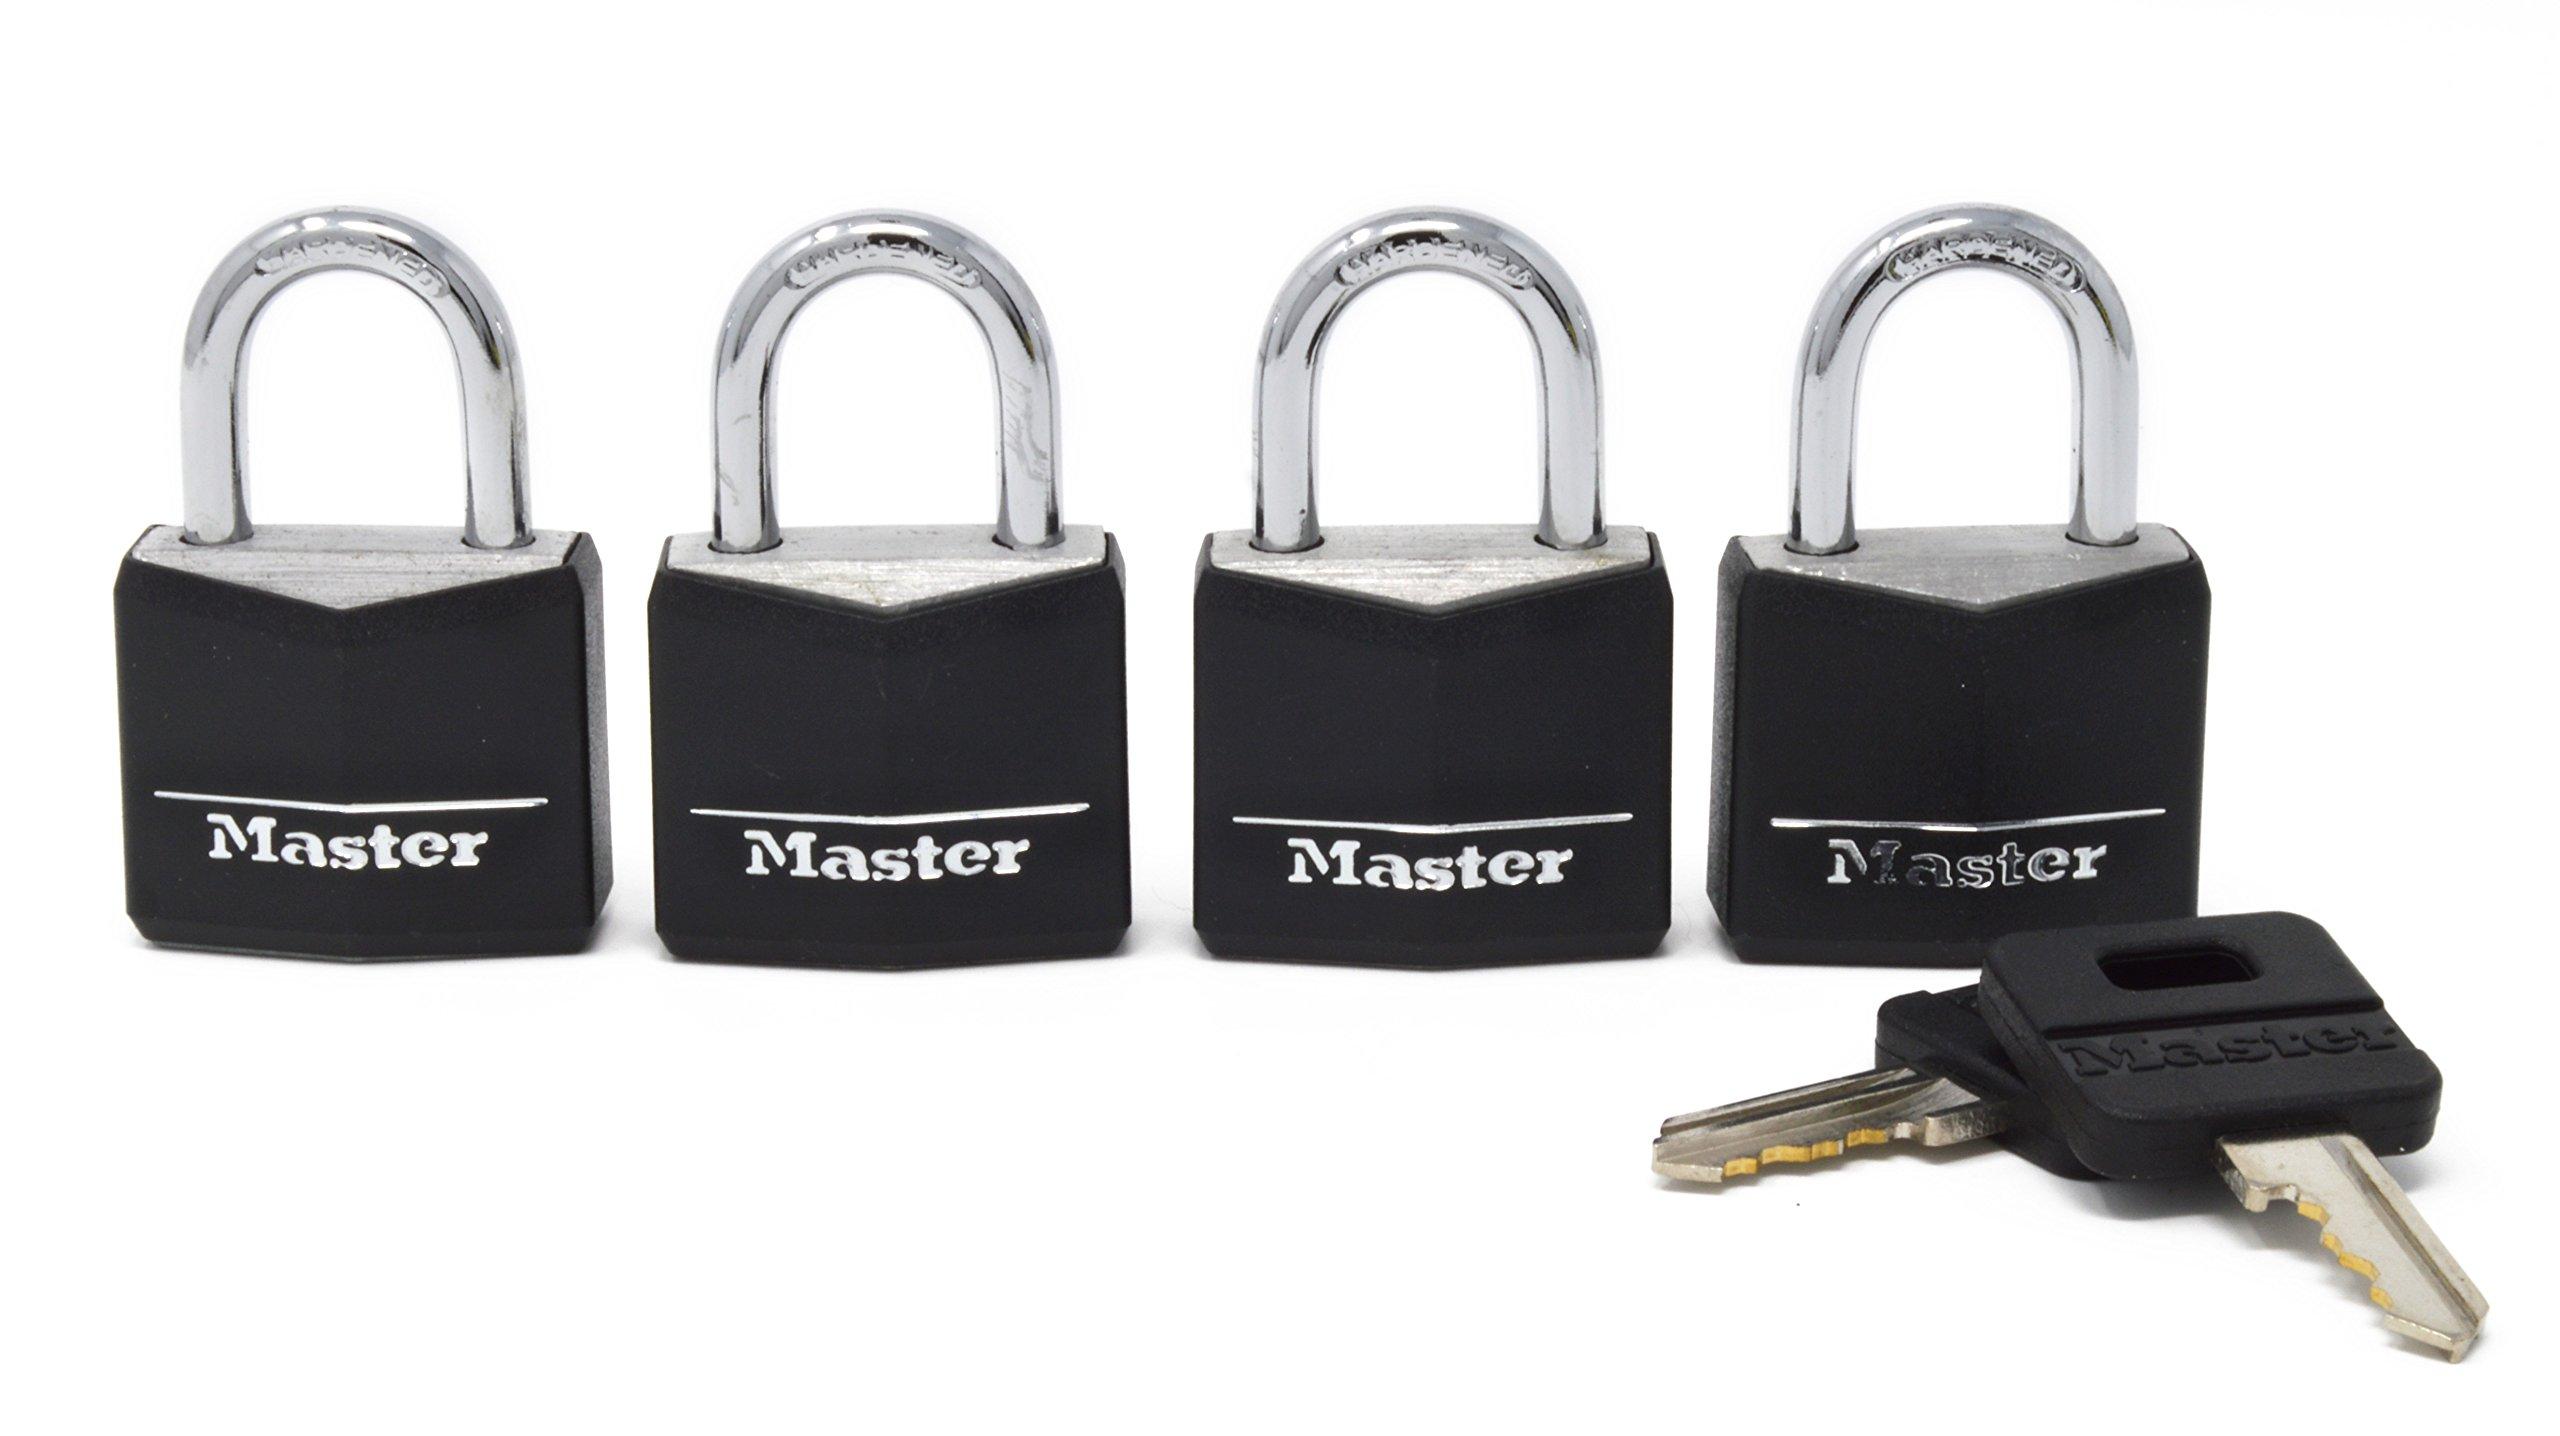 Master Lock 131Q Padlock with Key, 4 Pack, Black by Master Lock